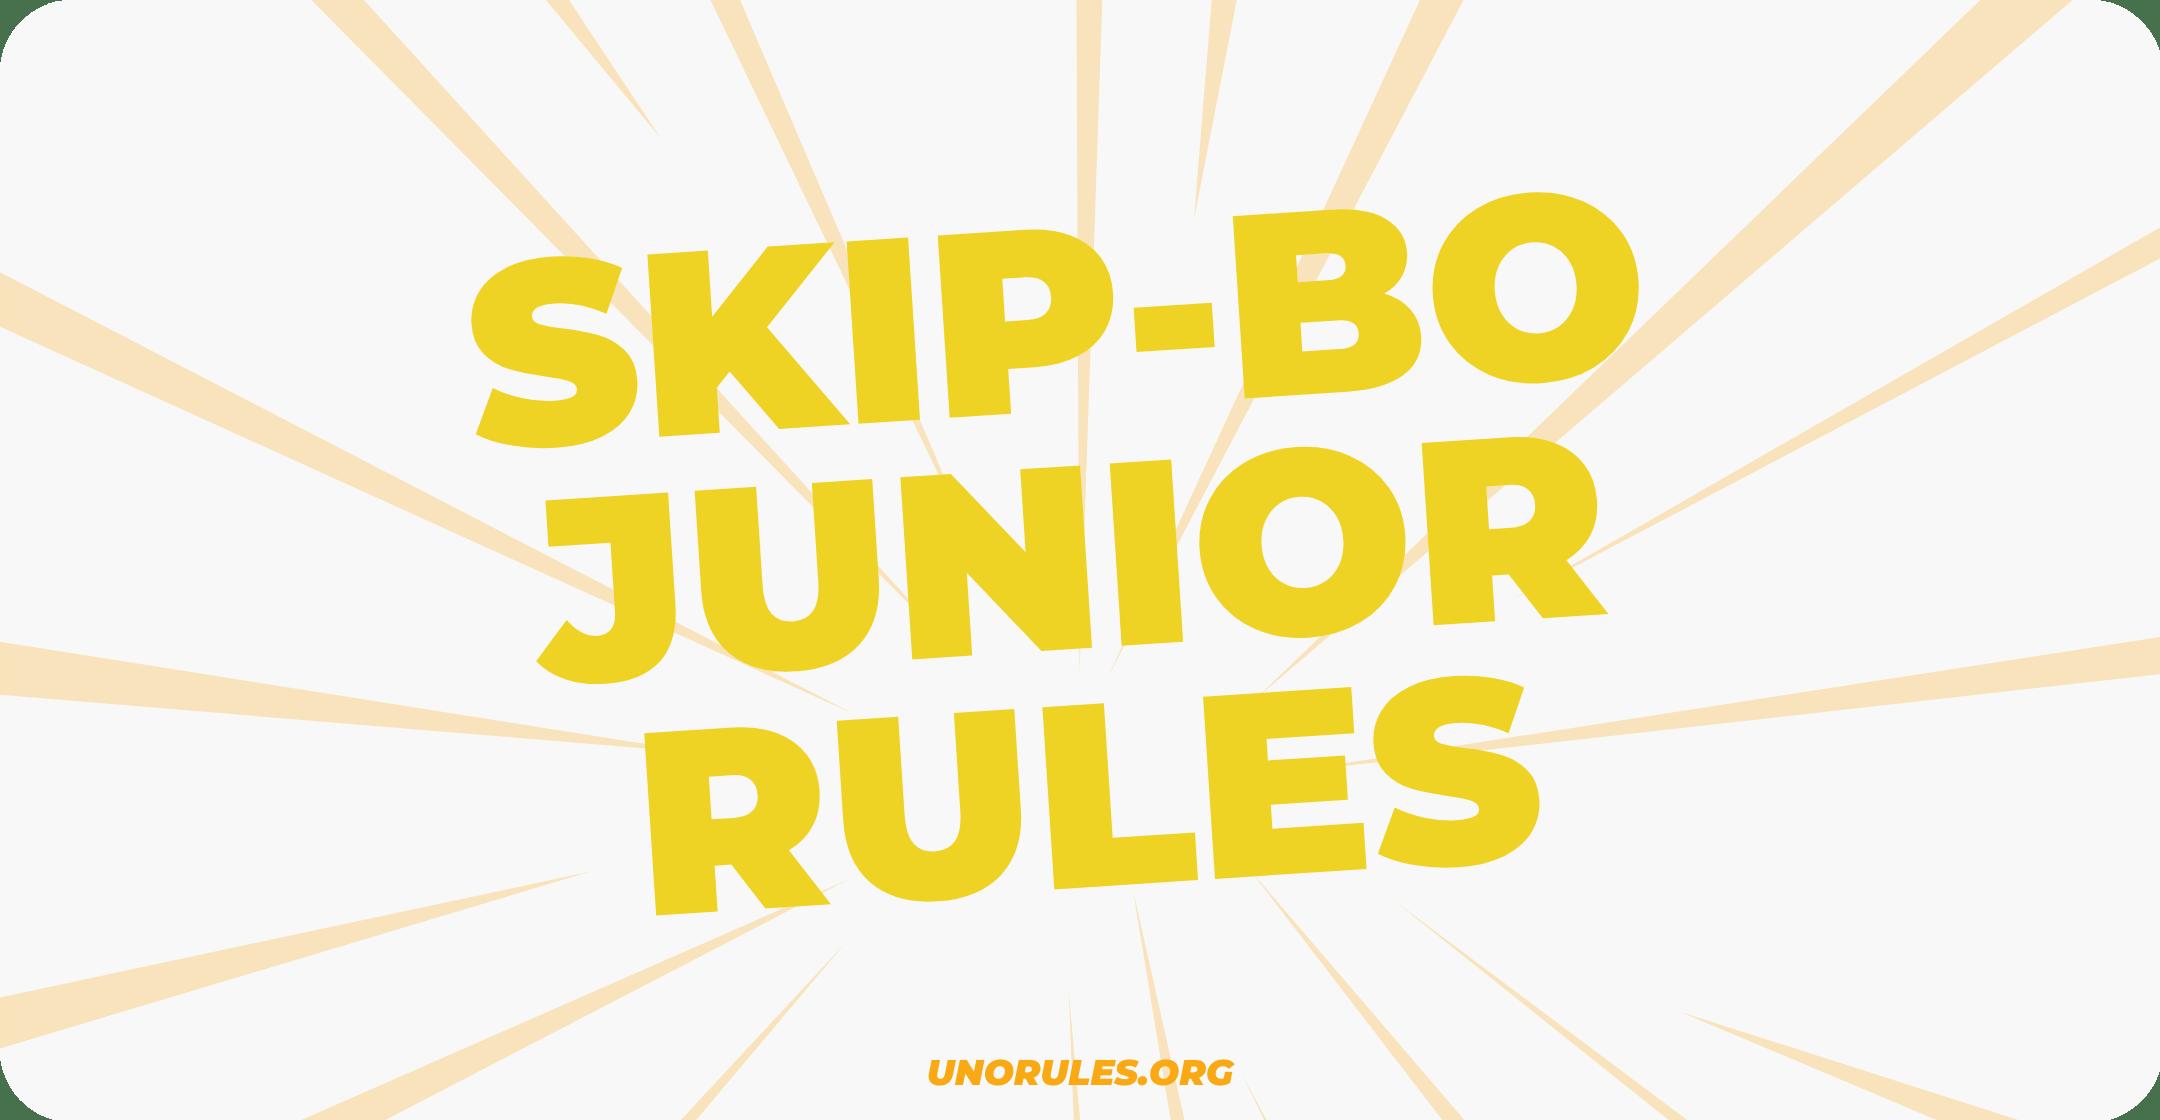 Skip-Bo junior rules